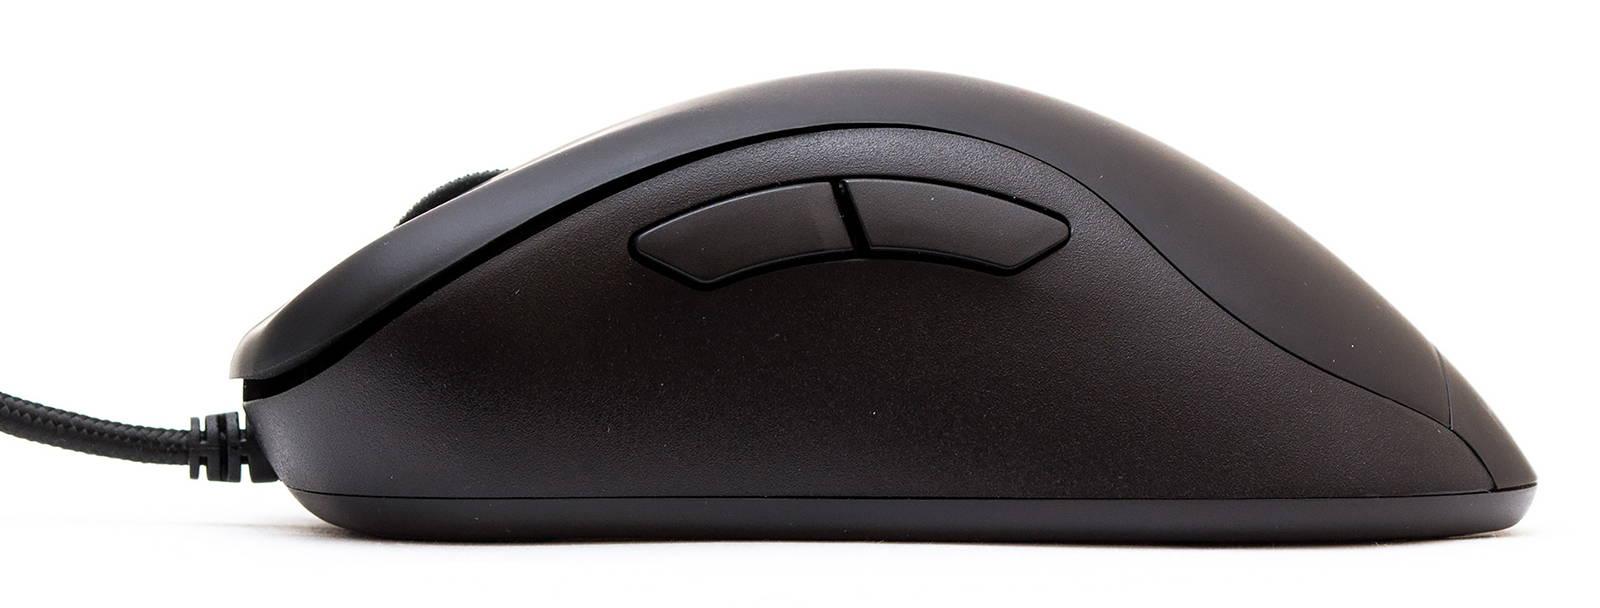 Мышка Hator Vortex Evo. Фото 5